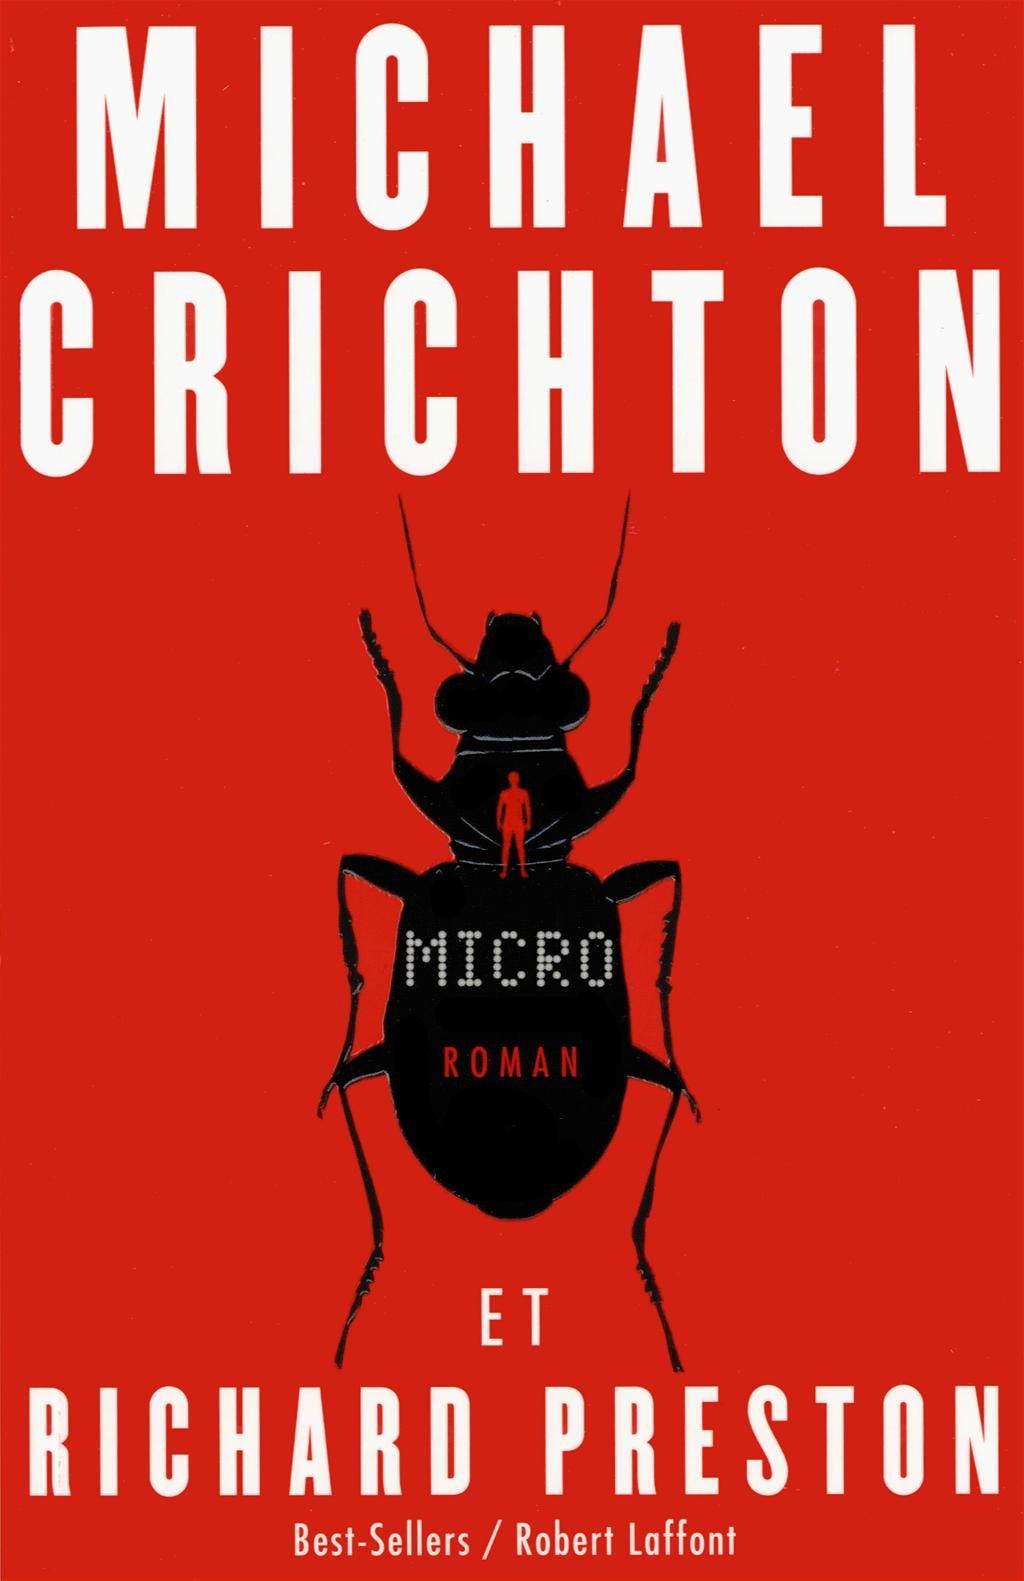 CRICHTON, Michaël - Micro